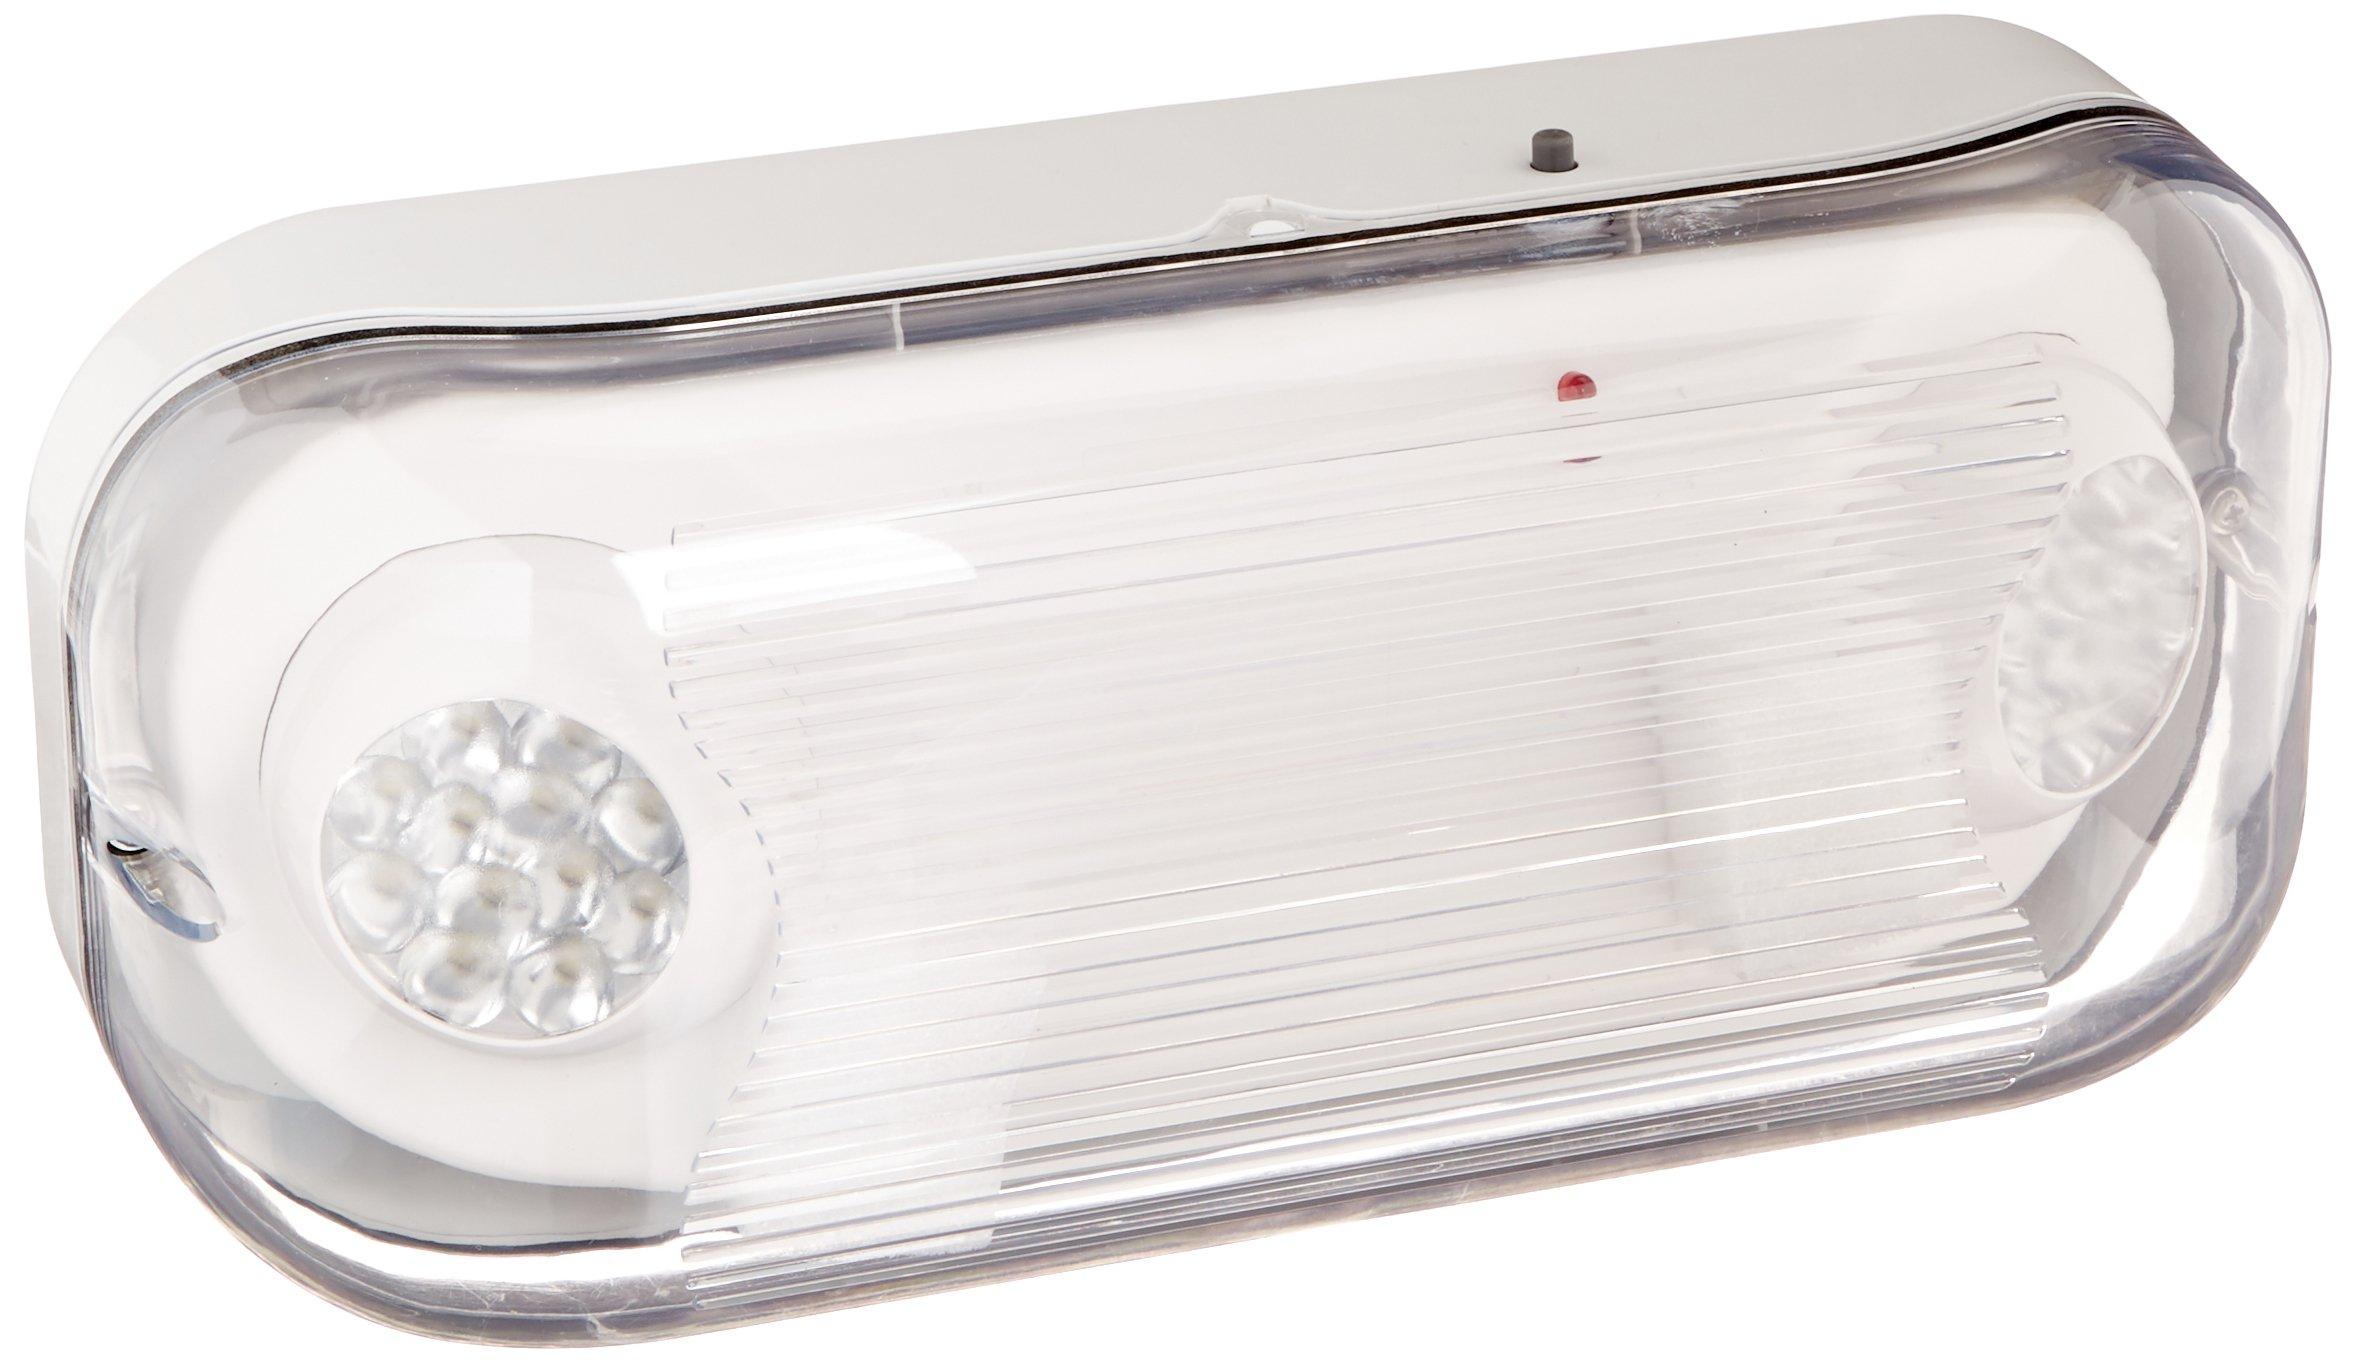 Ciata Lighting EMR-WP-LED Wet Location Outdoor Emergency Light with Battery Back-up, White